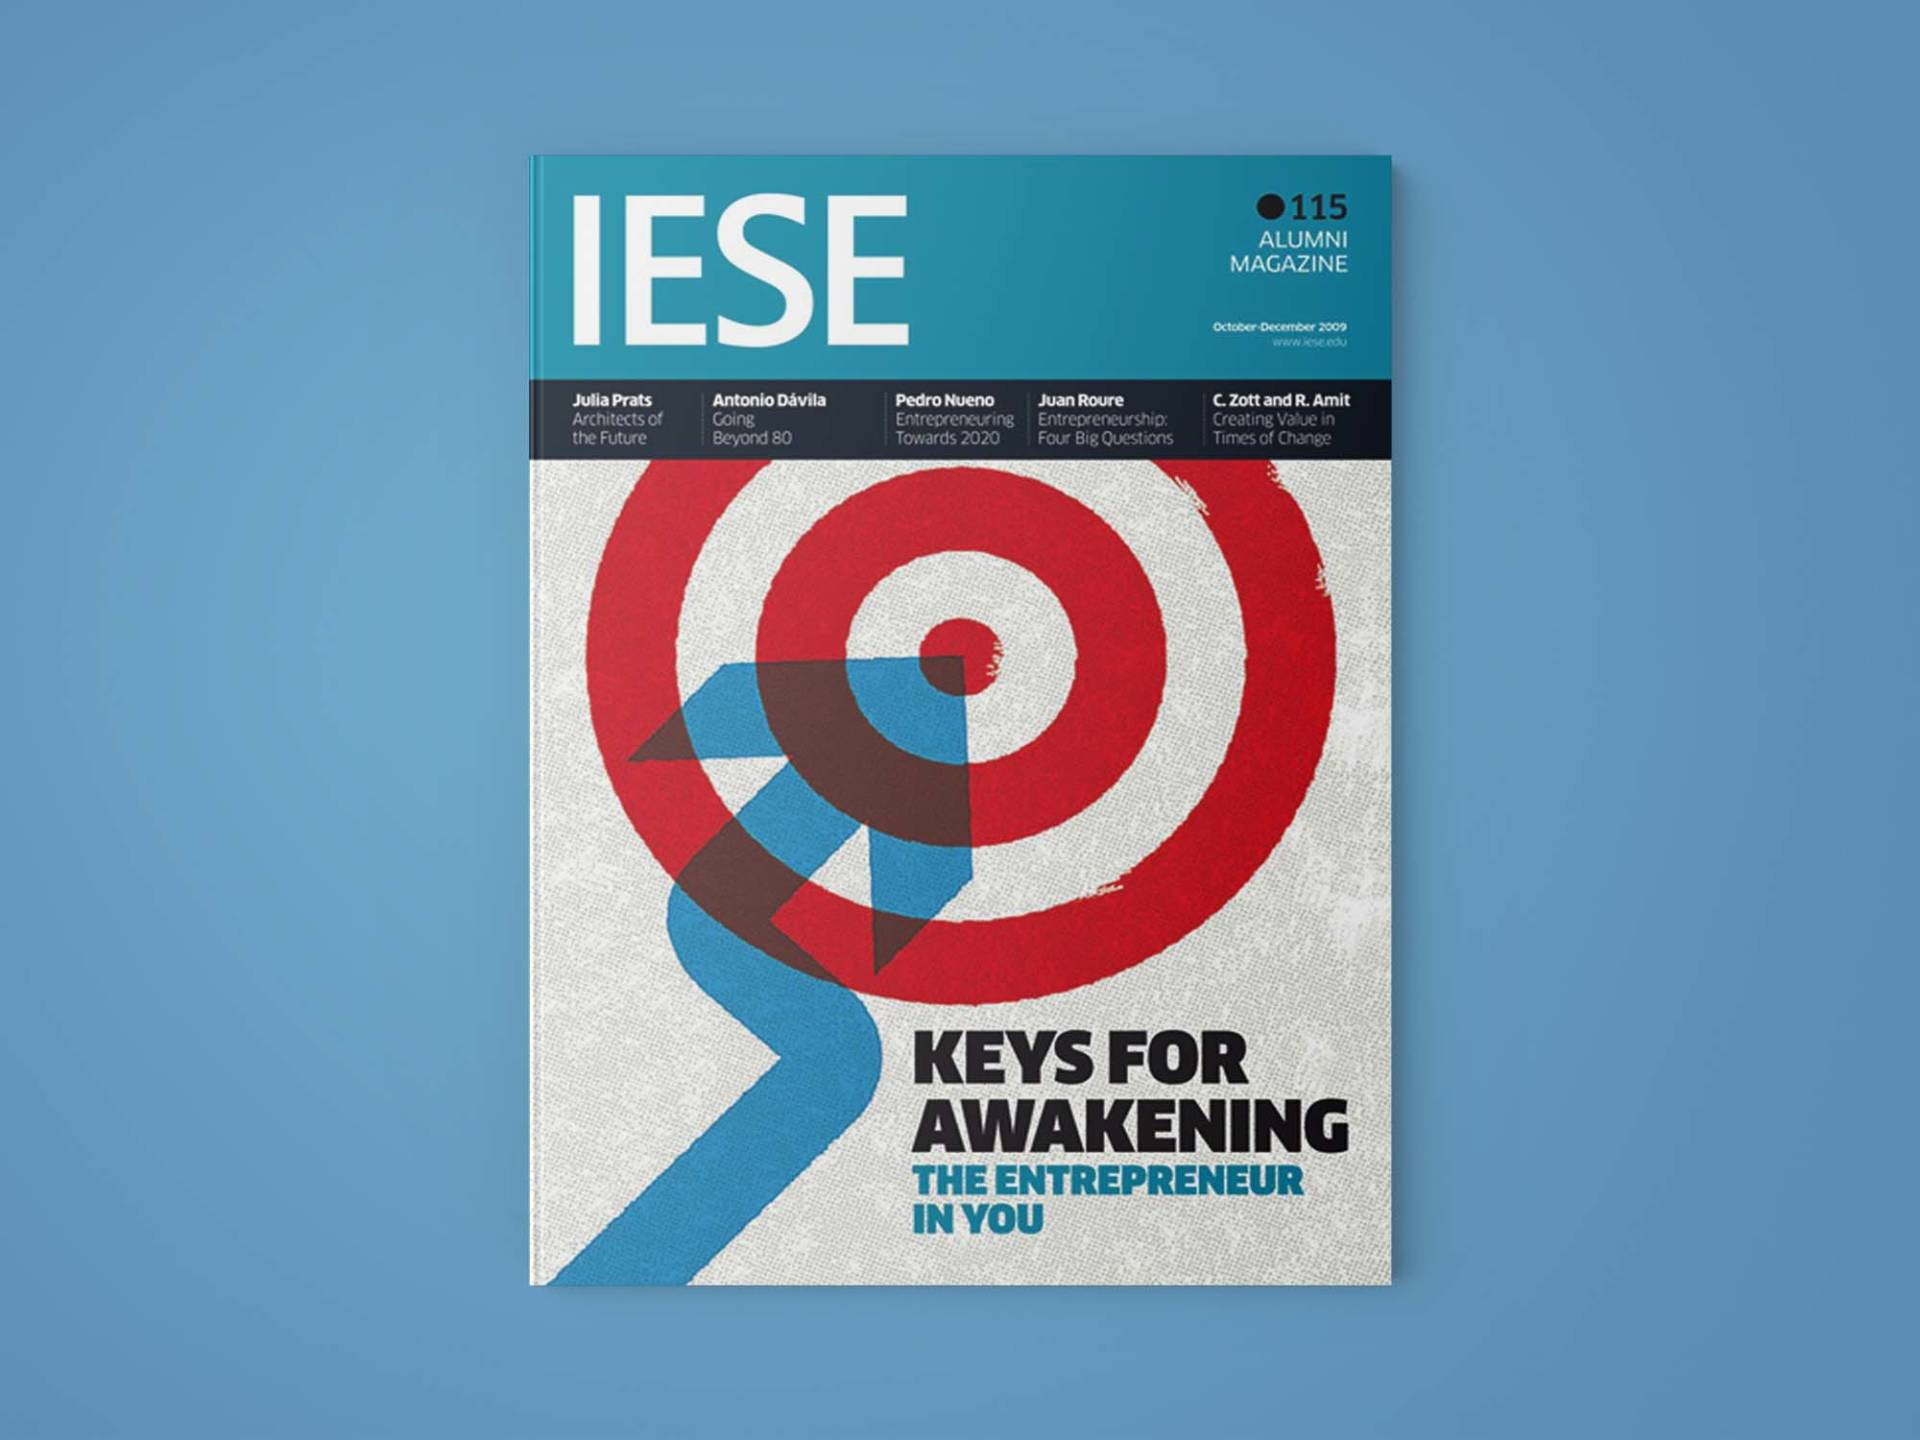 Iese_01_Wenceslau_News_Design